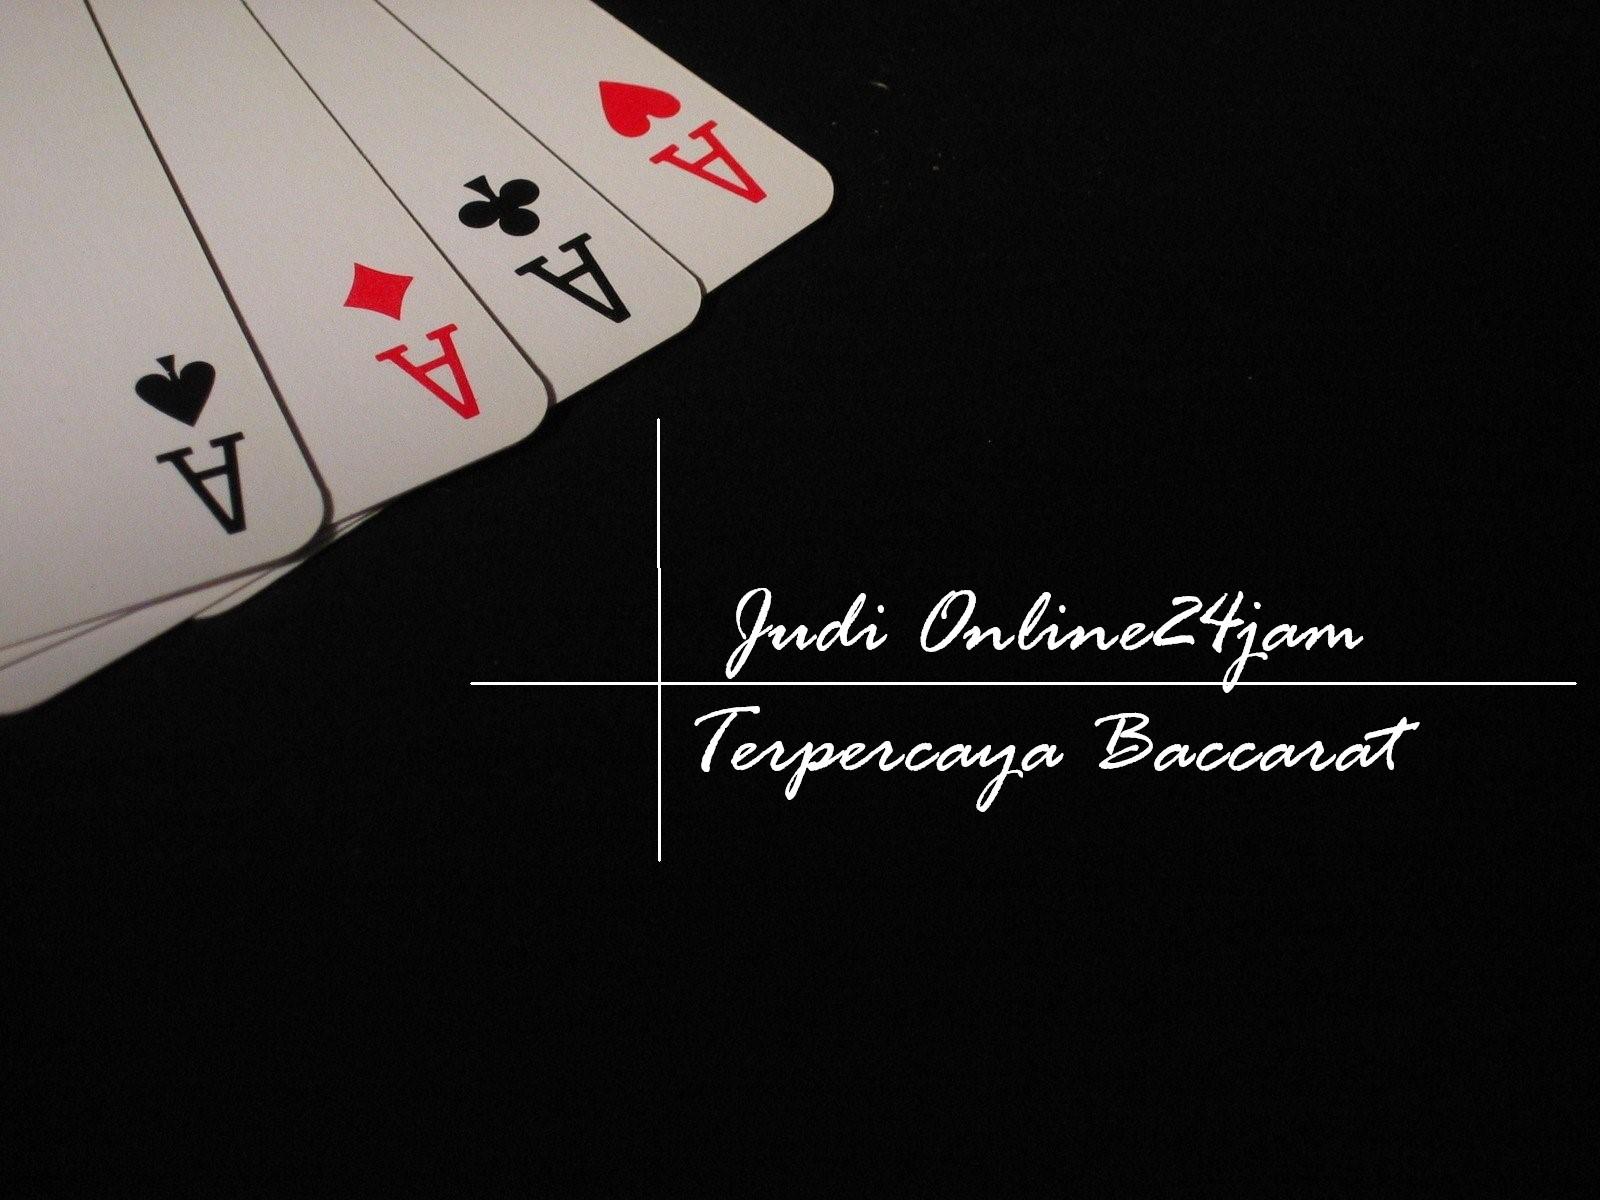 Judi Online24jam Terpercaya Baccarat